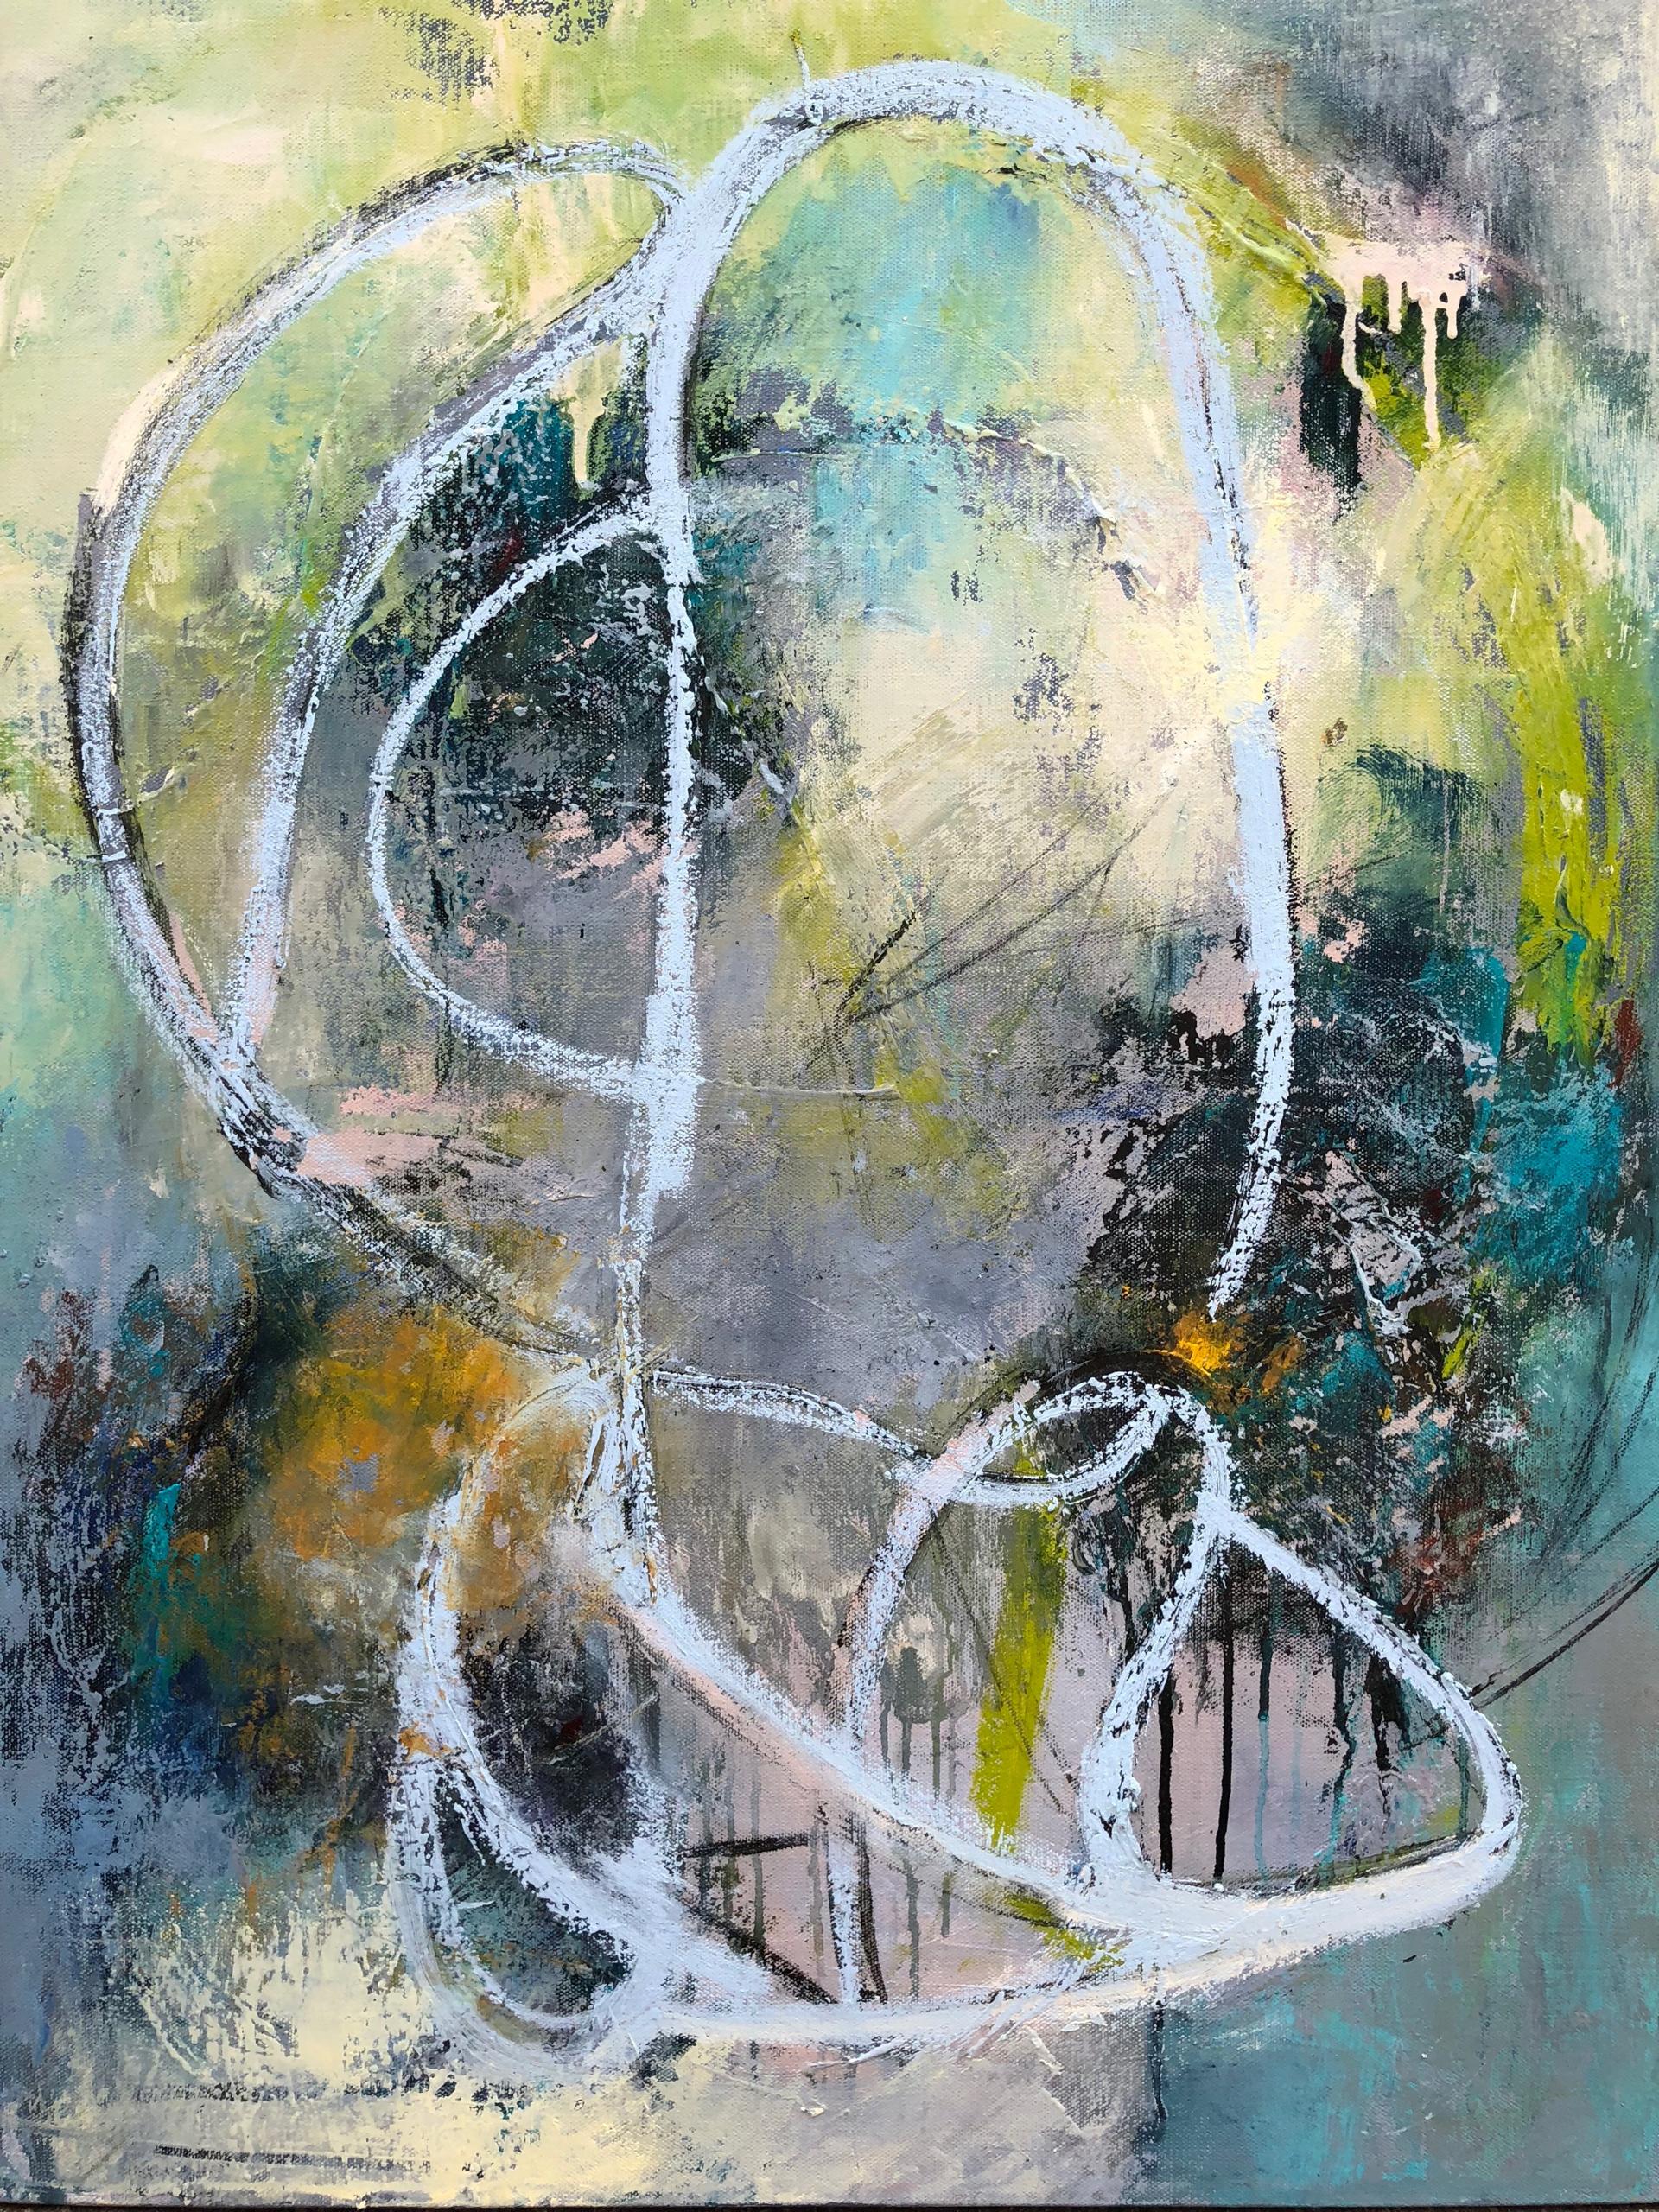 Unraveled  by Alicia Gitlitz